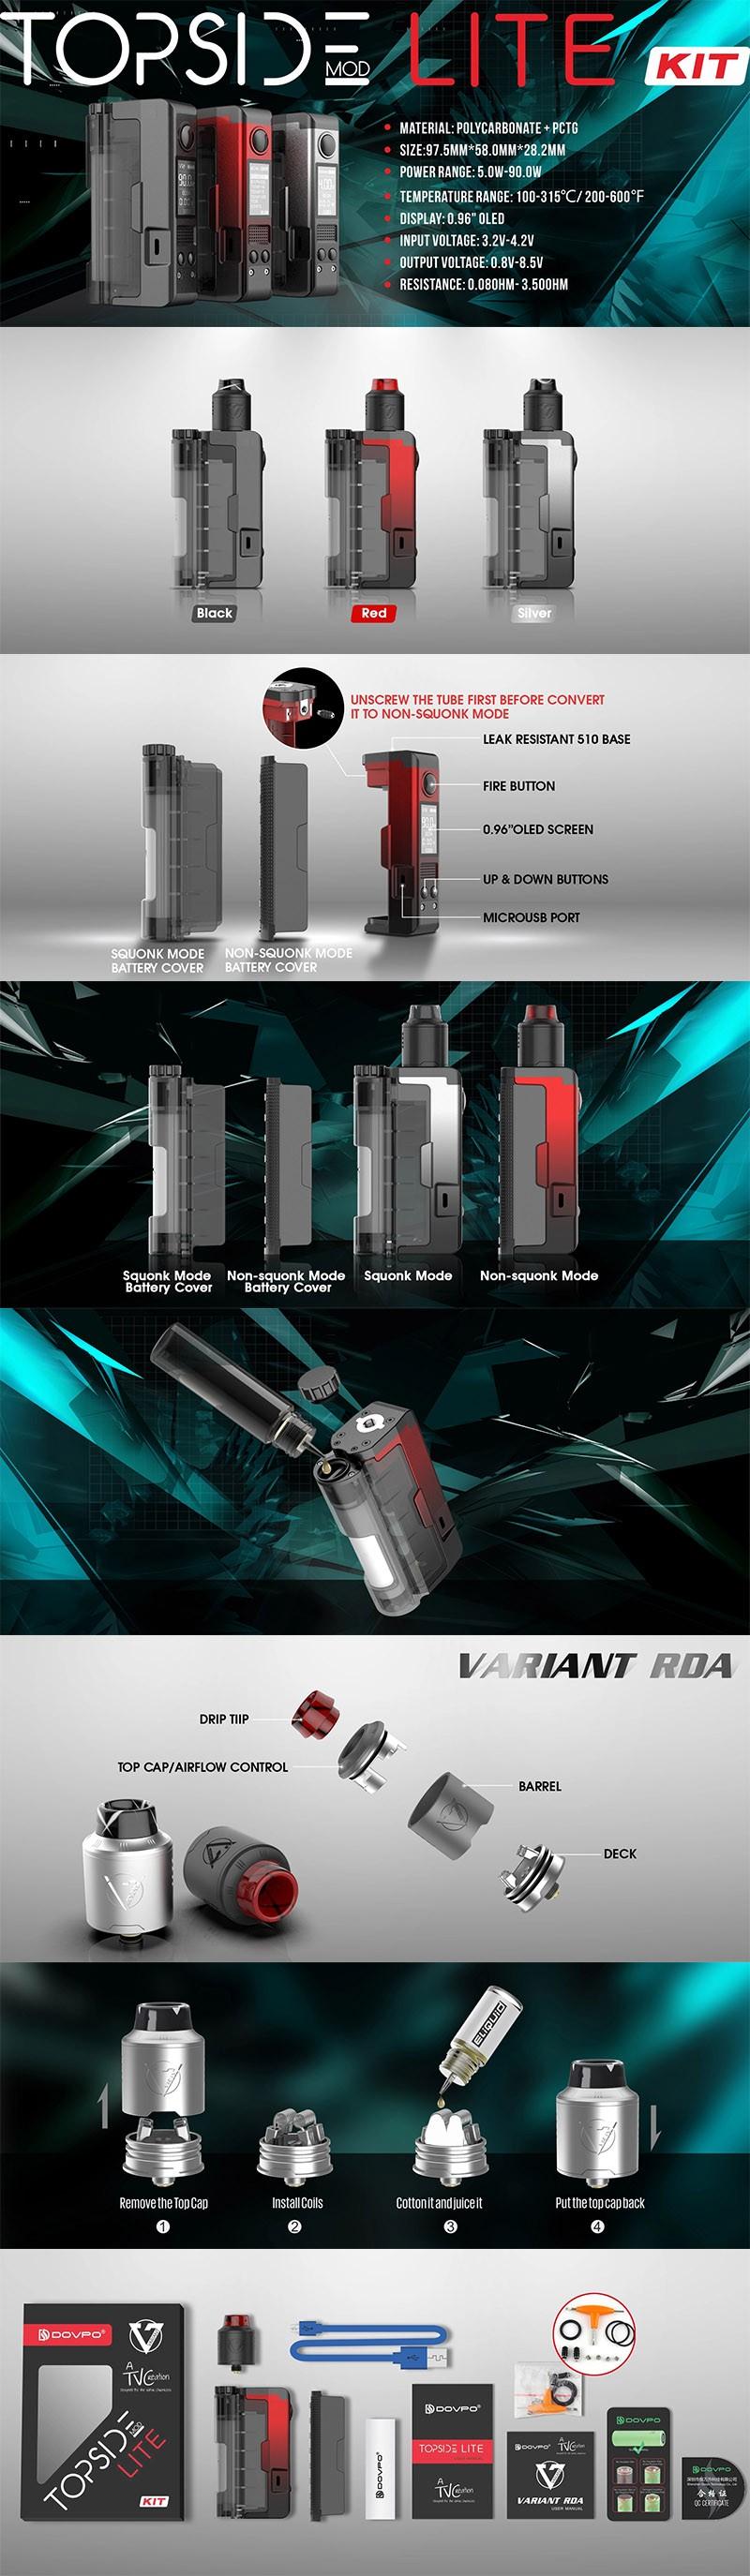 Dovpo 90W Topside Lite Kit TC VW Box Mod + Variant RDA Atomizer